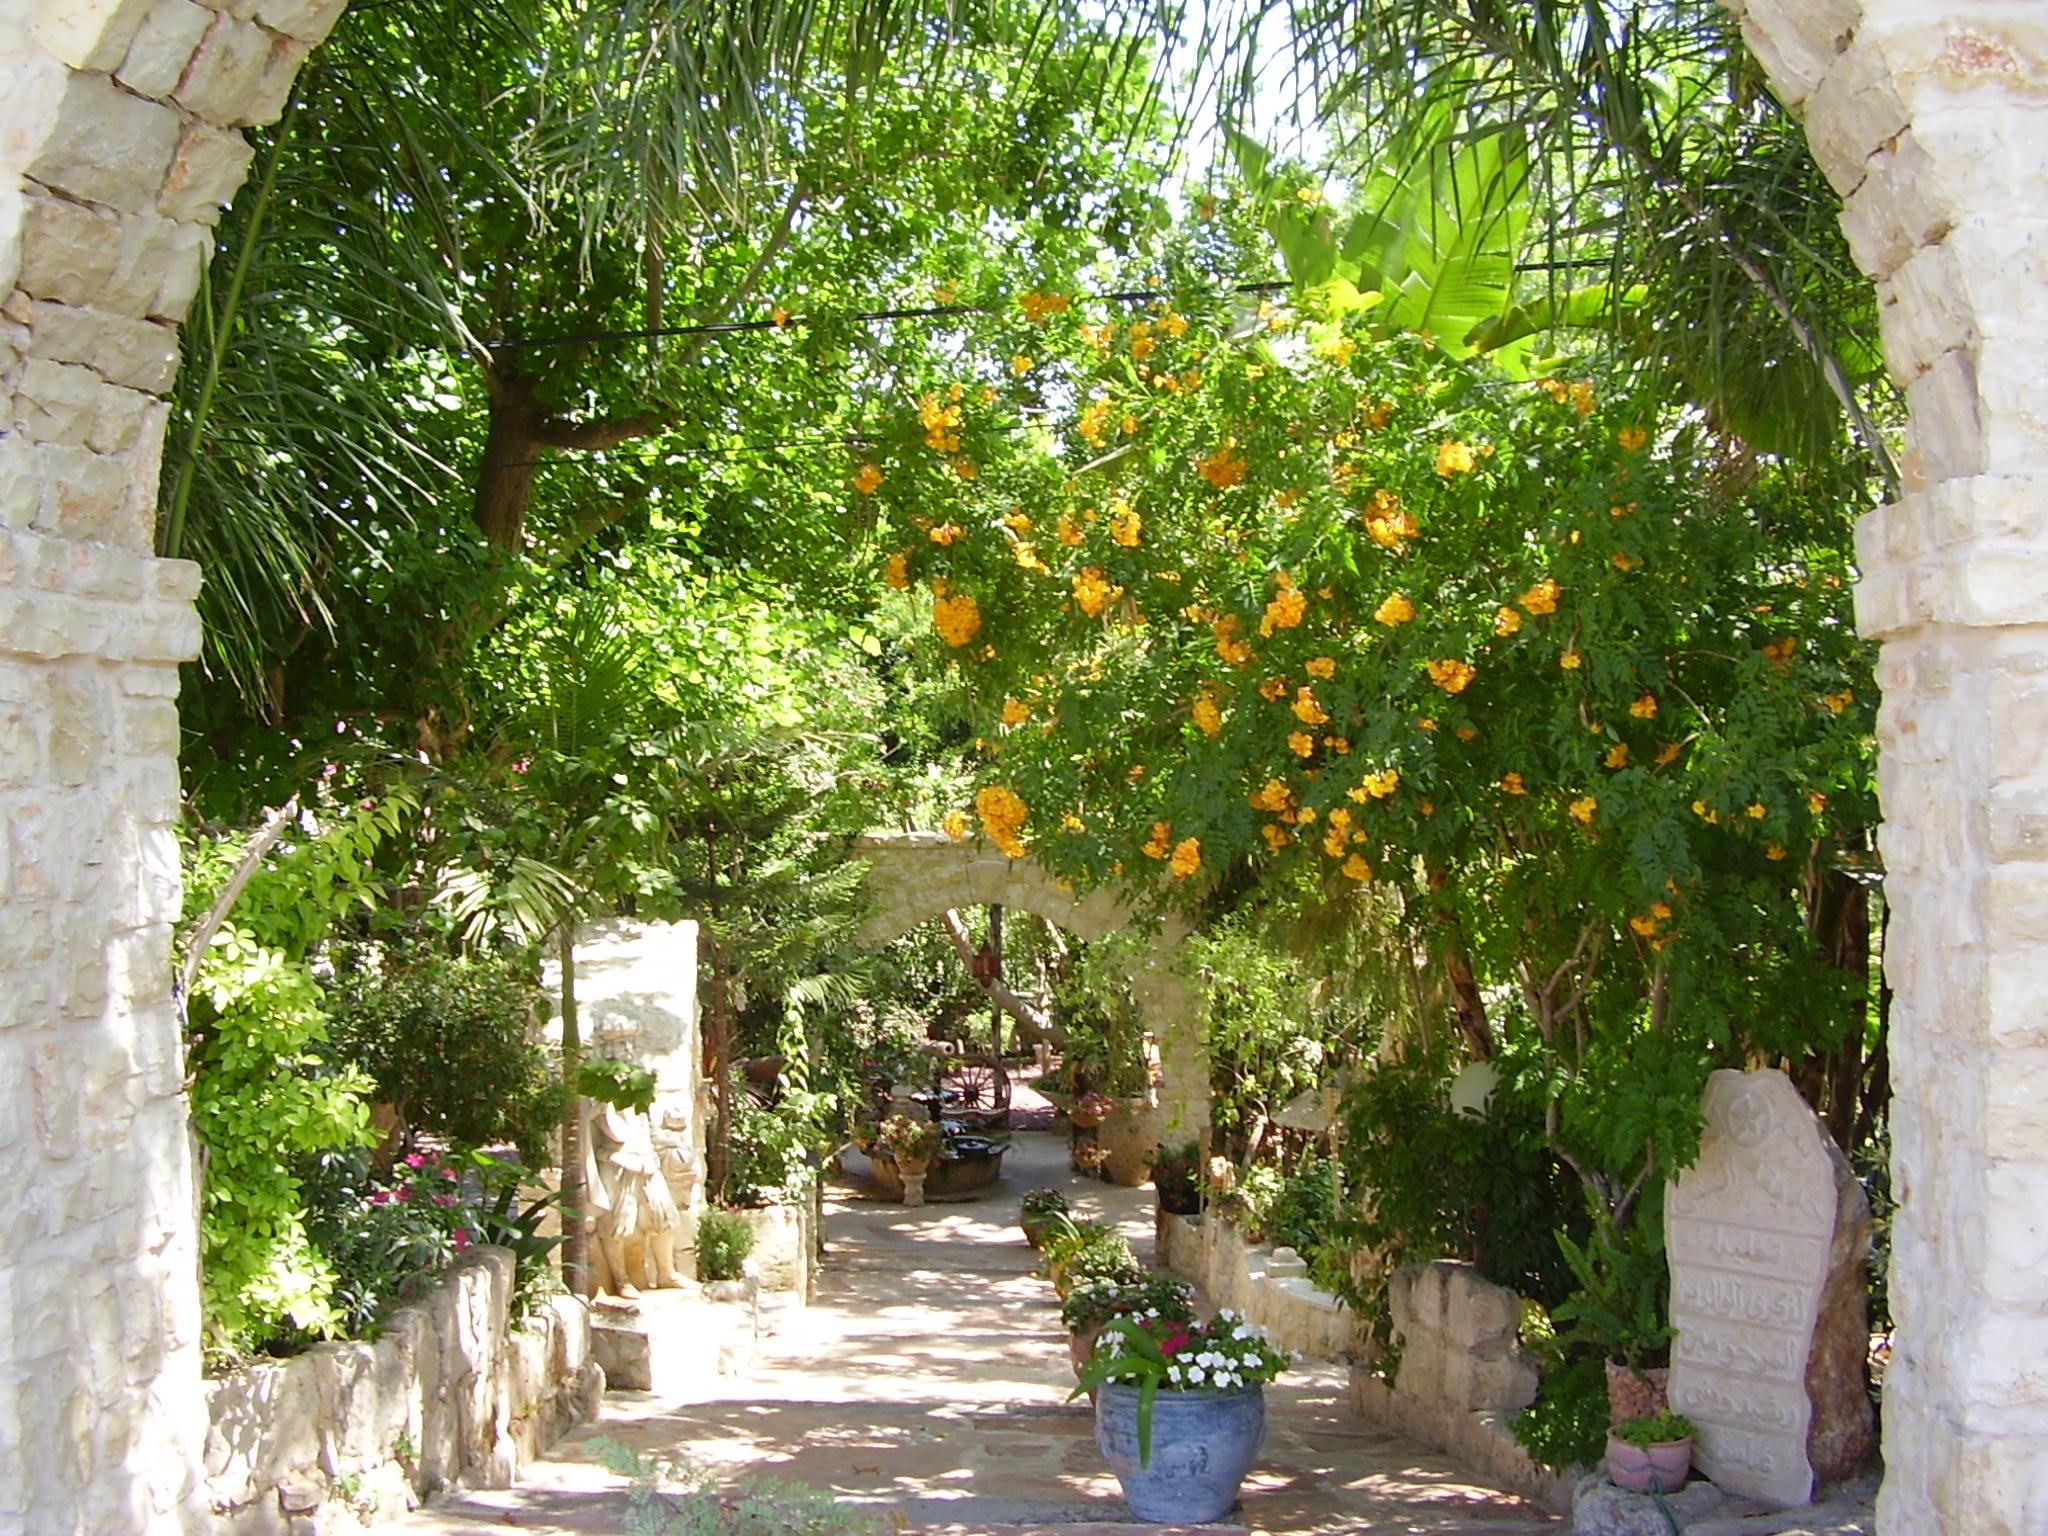 best garden ideas pictures - File PikiWiki Israel 5035 entrance to el mona garden